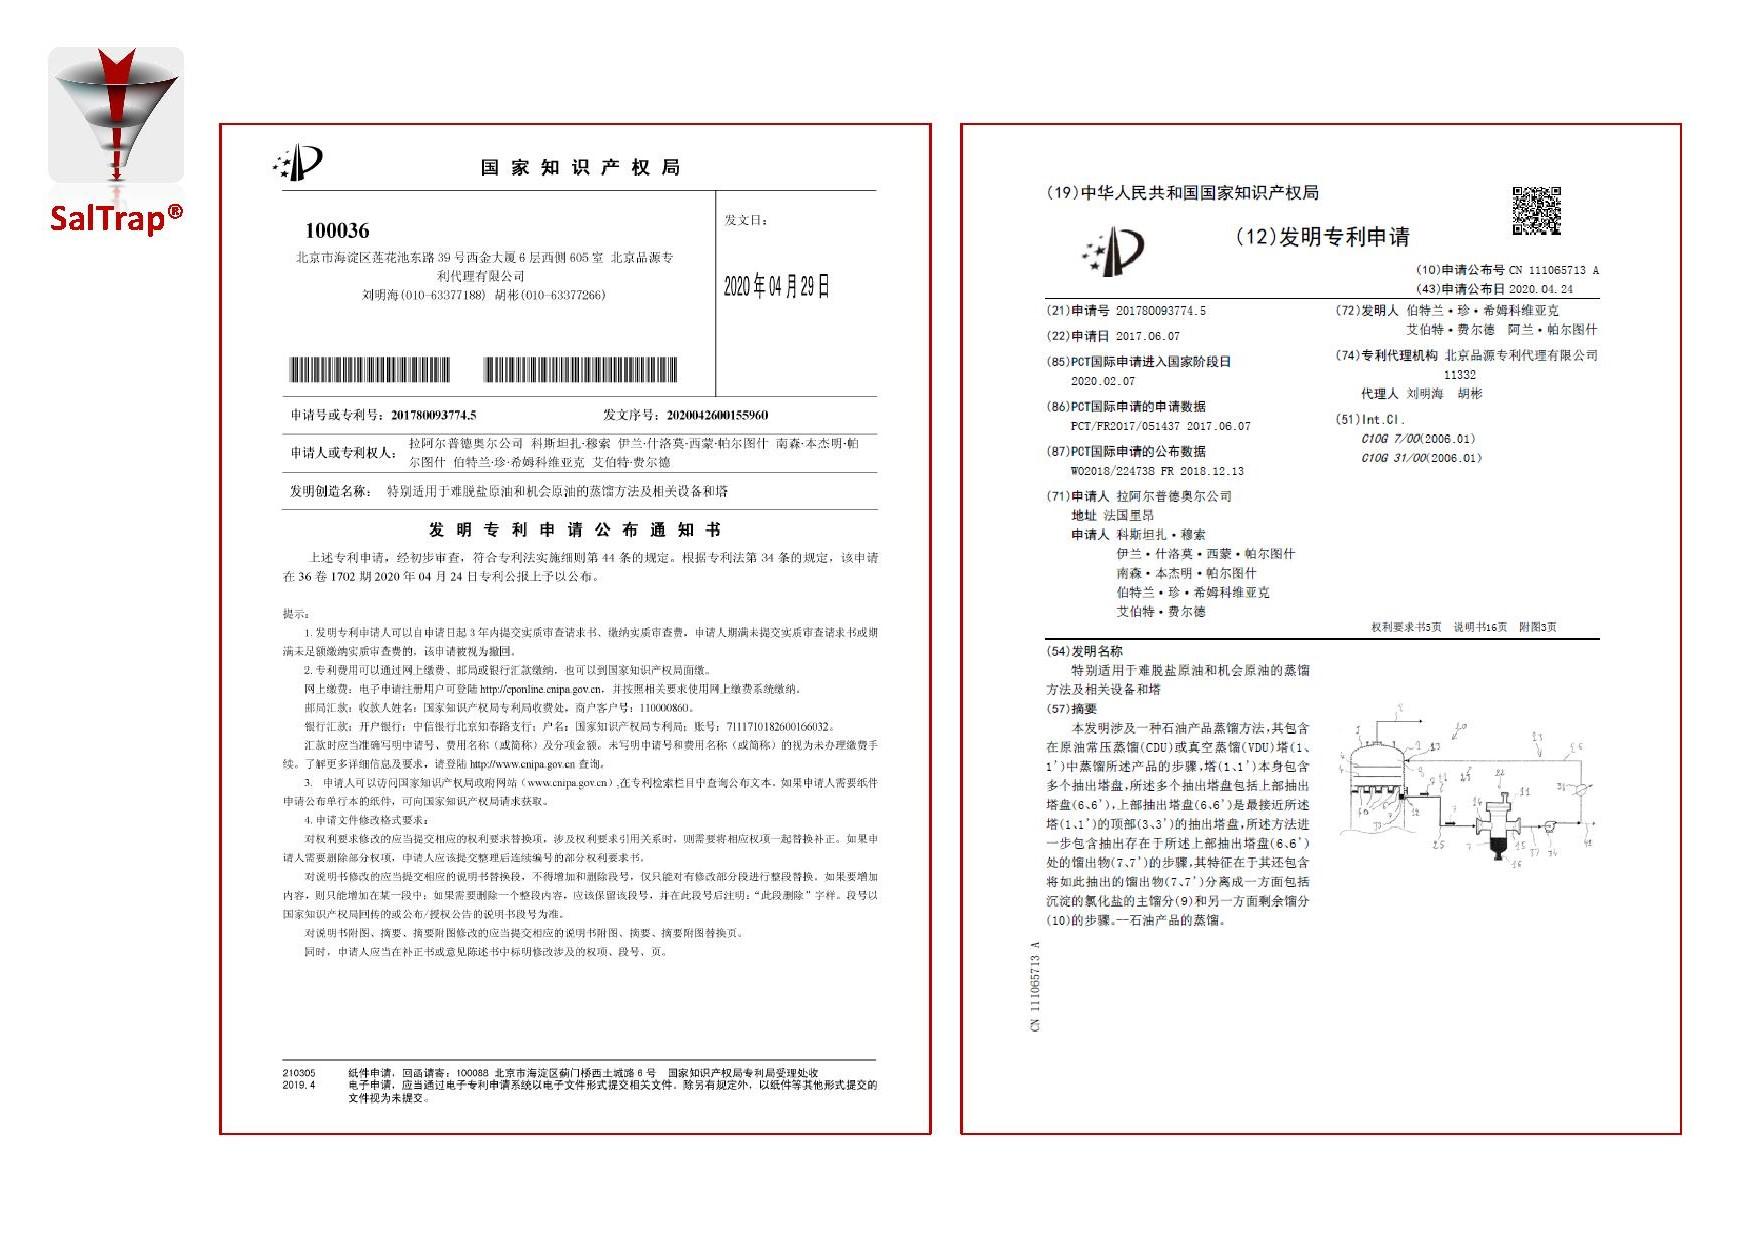 SalTrap Chinese patent application publication